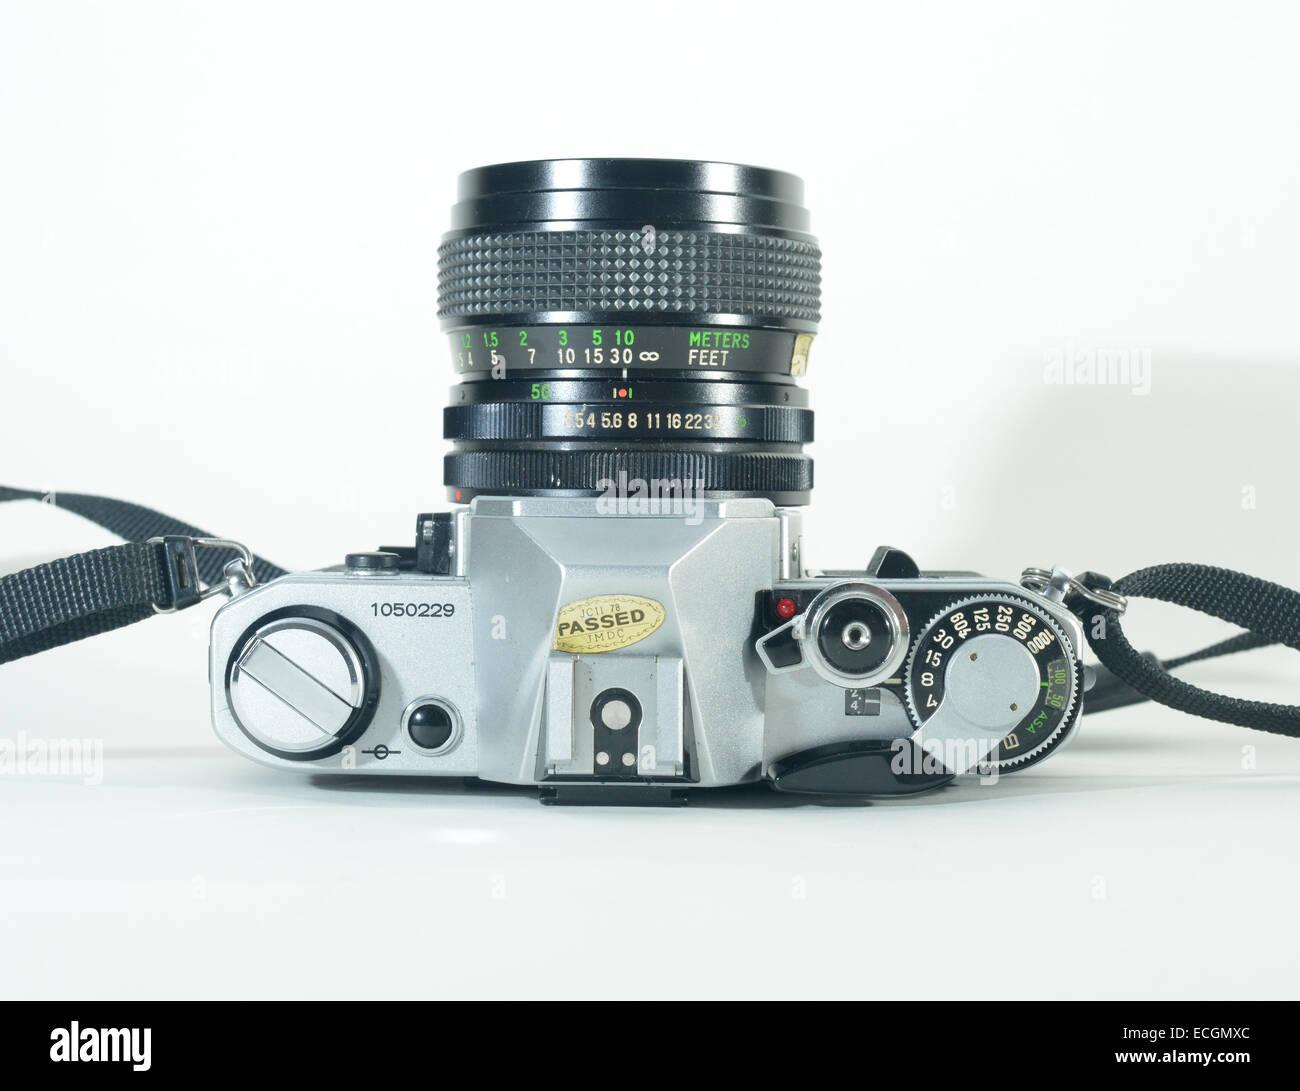 Canon AE1 SLR manual film camera - Stock Image